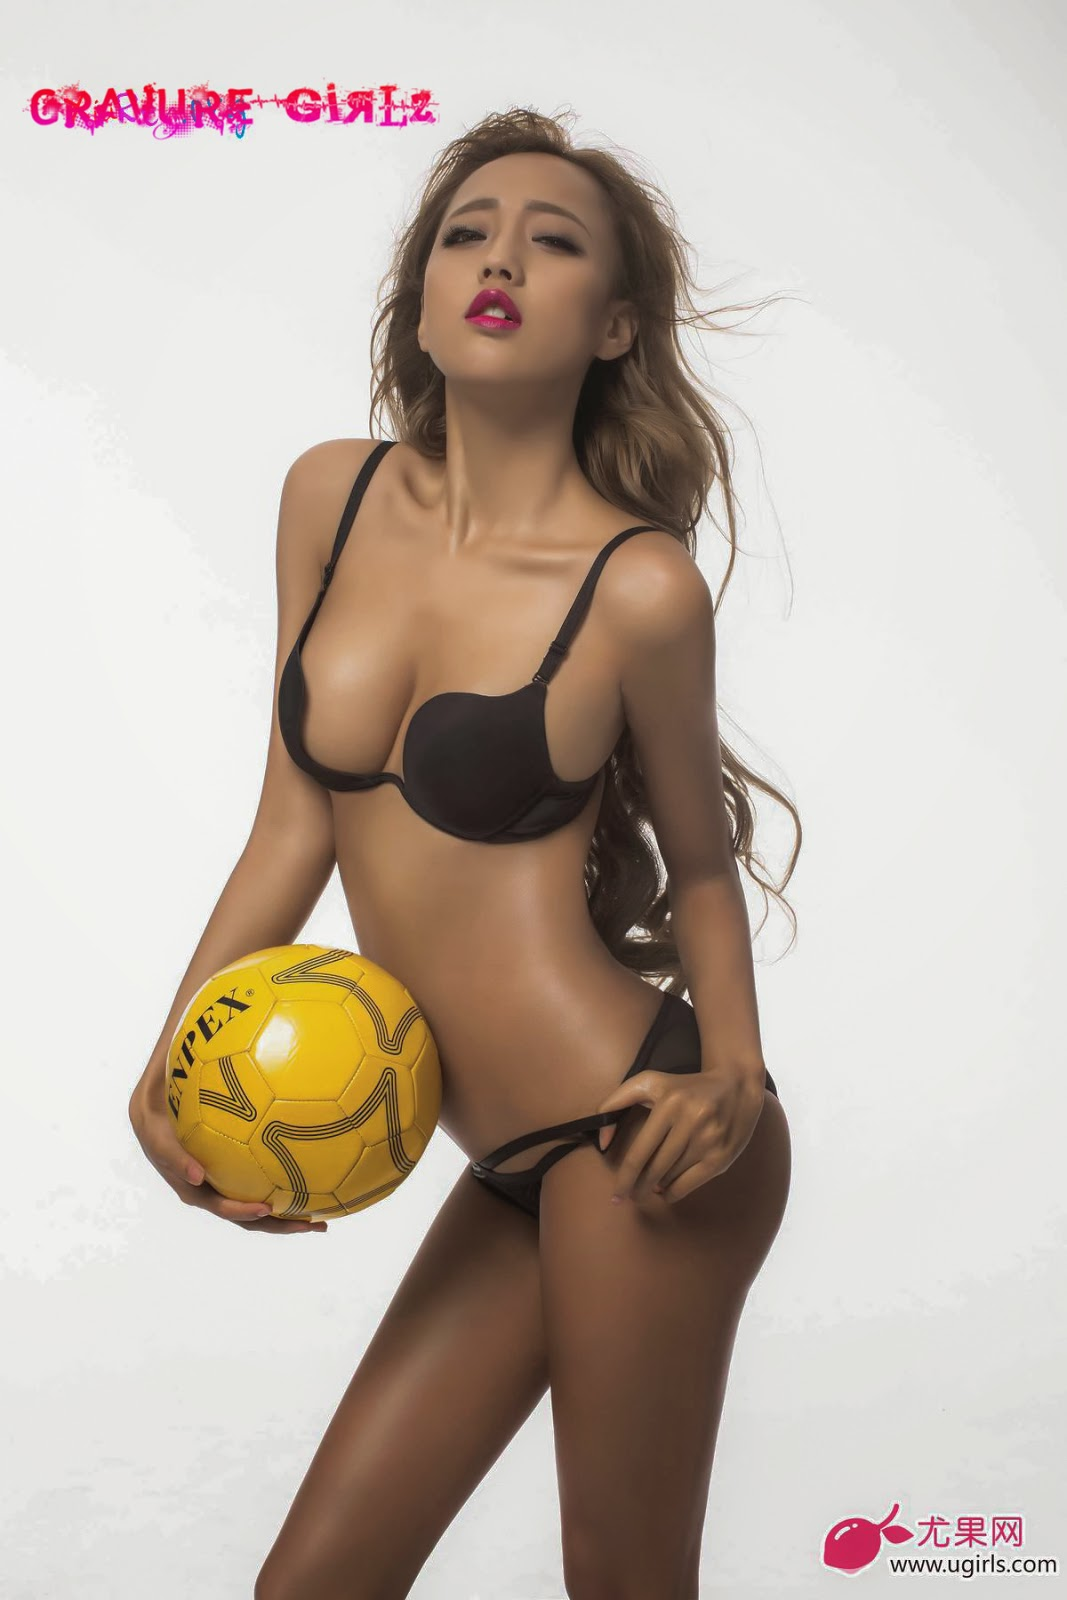 Soccer World Cup Bikini Babes Topless [ugirls_尤果网] 世界杯德国 ...